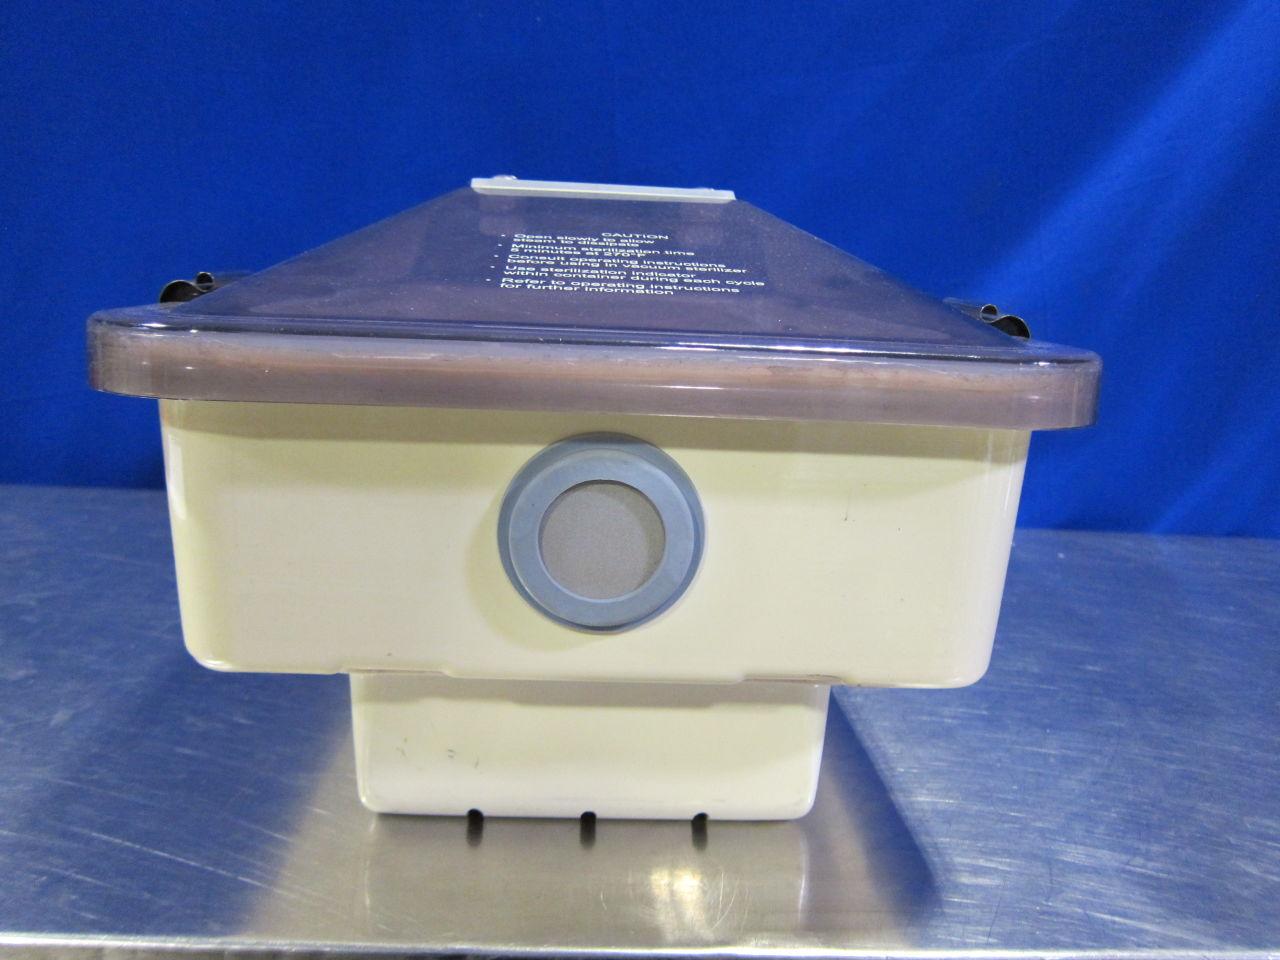 SYMMETRY MEDICAL Flashpak 9050 Surgical Cases